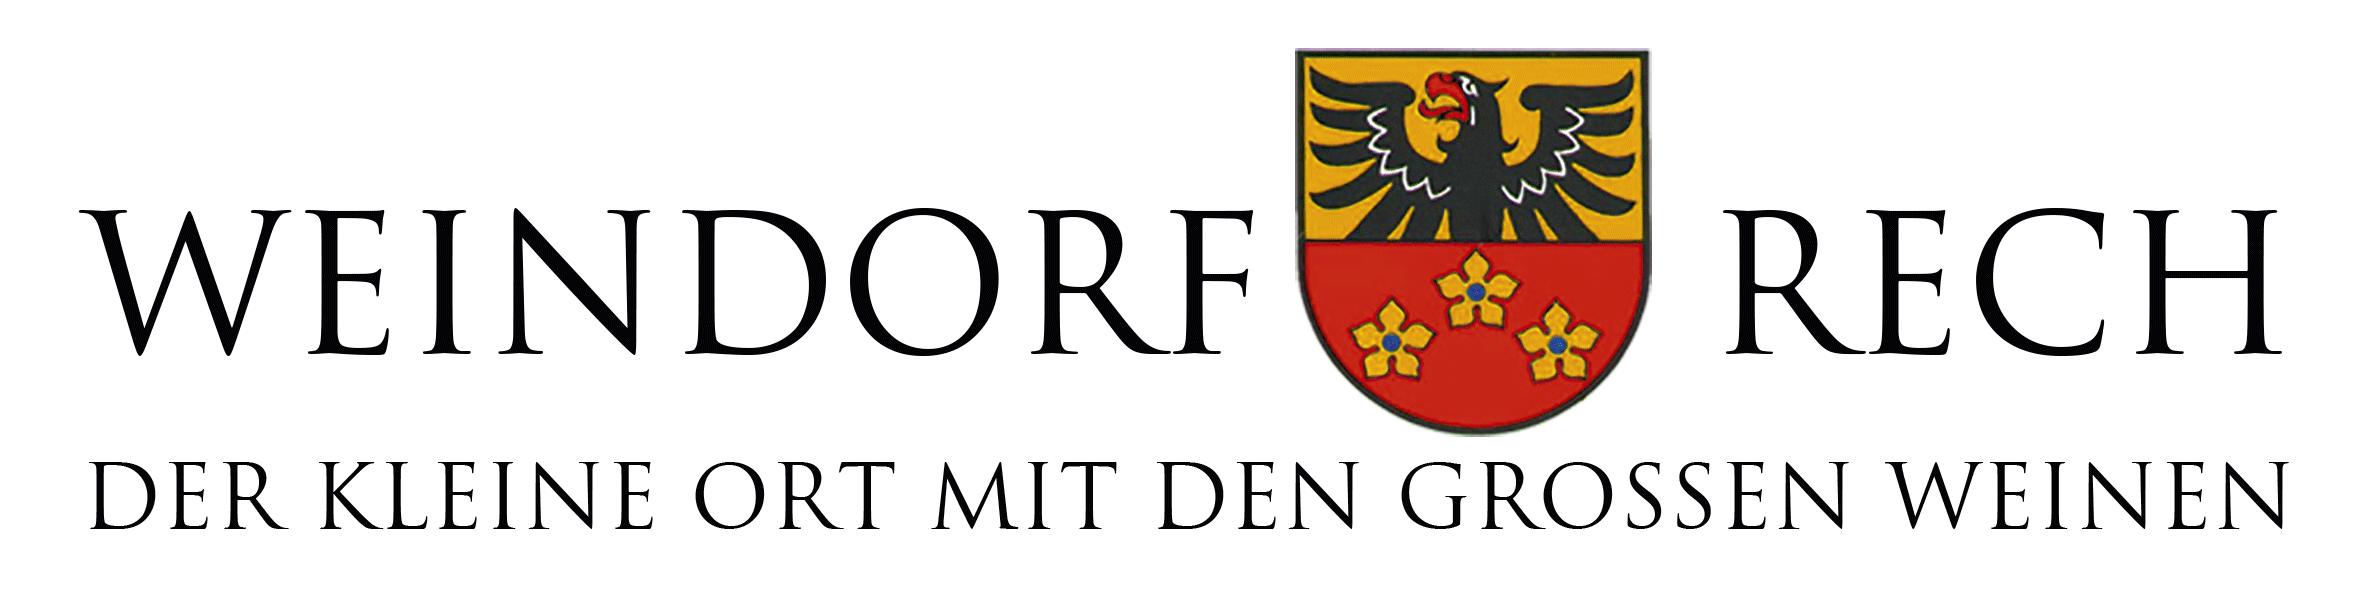 Weindorf Rech